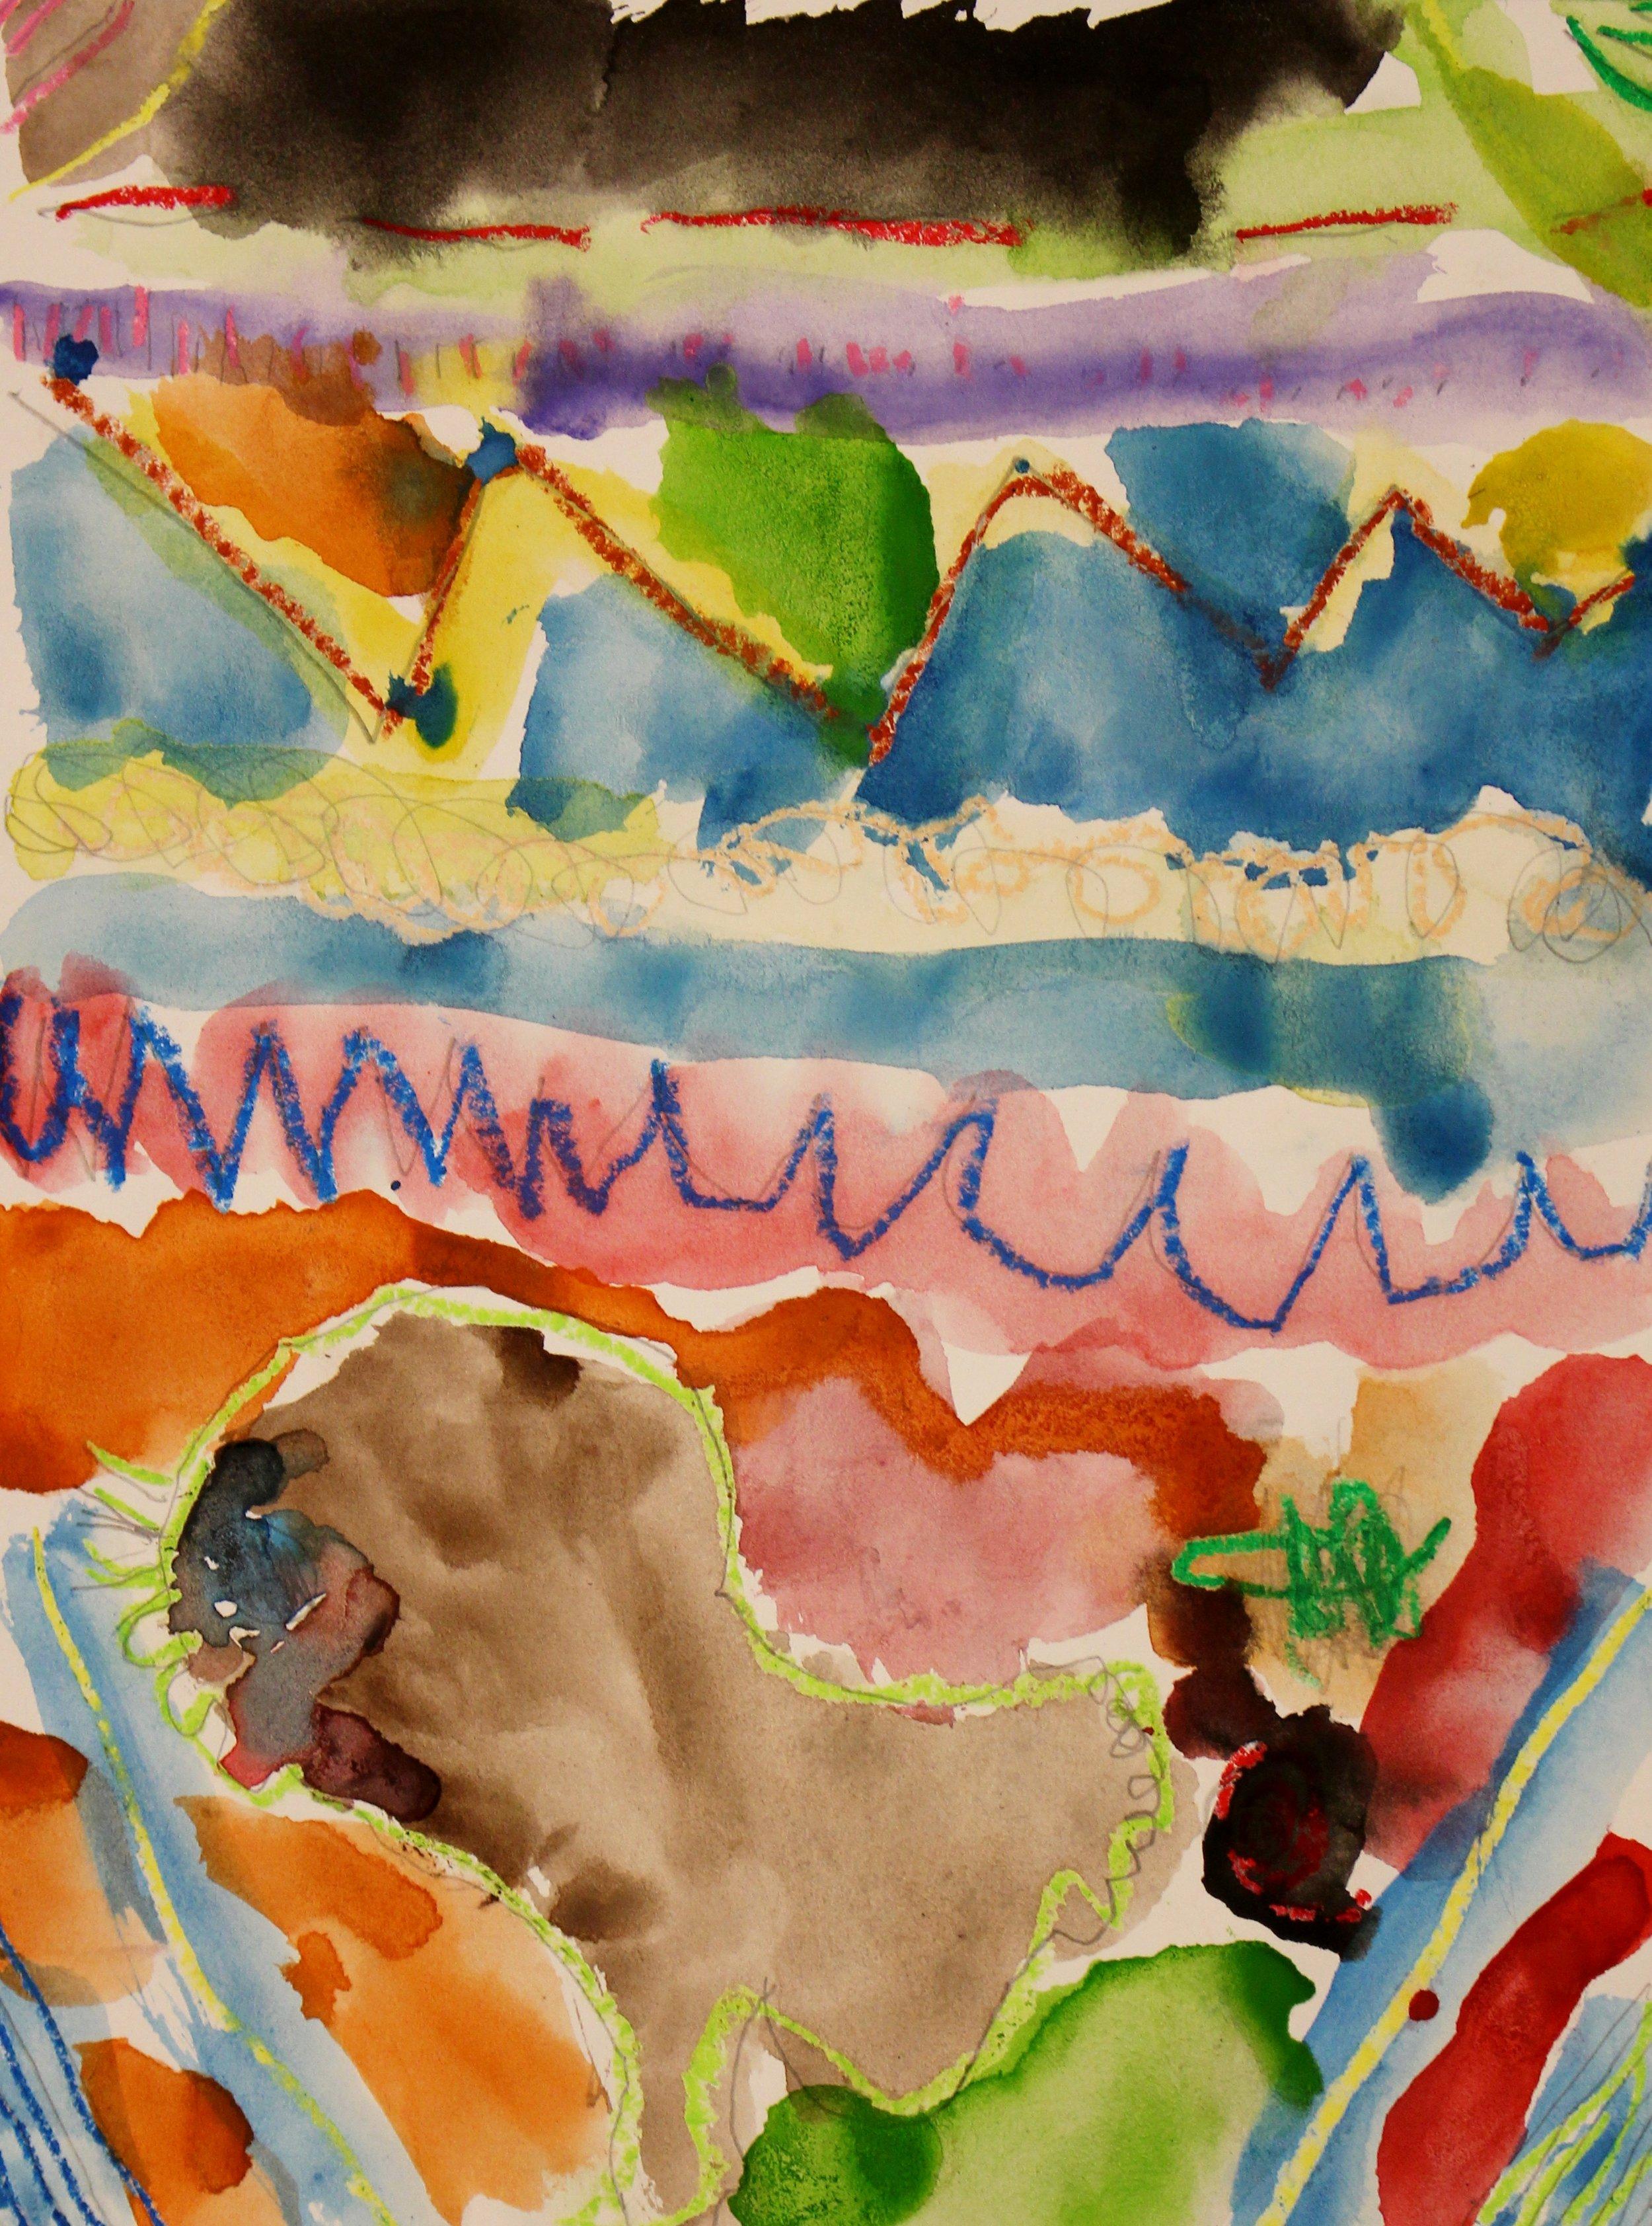 Kindergarten: Riley Smith (Cave art)